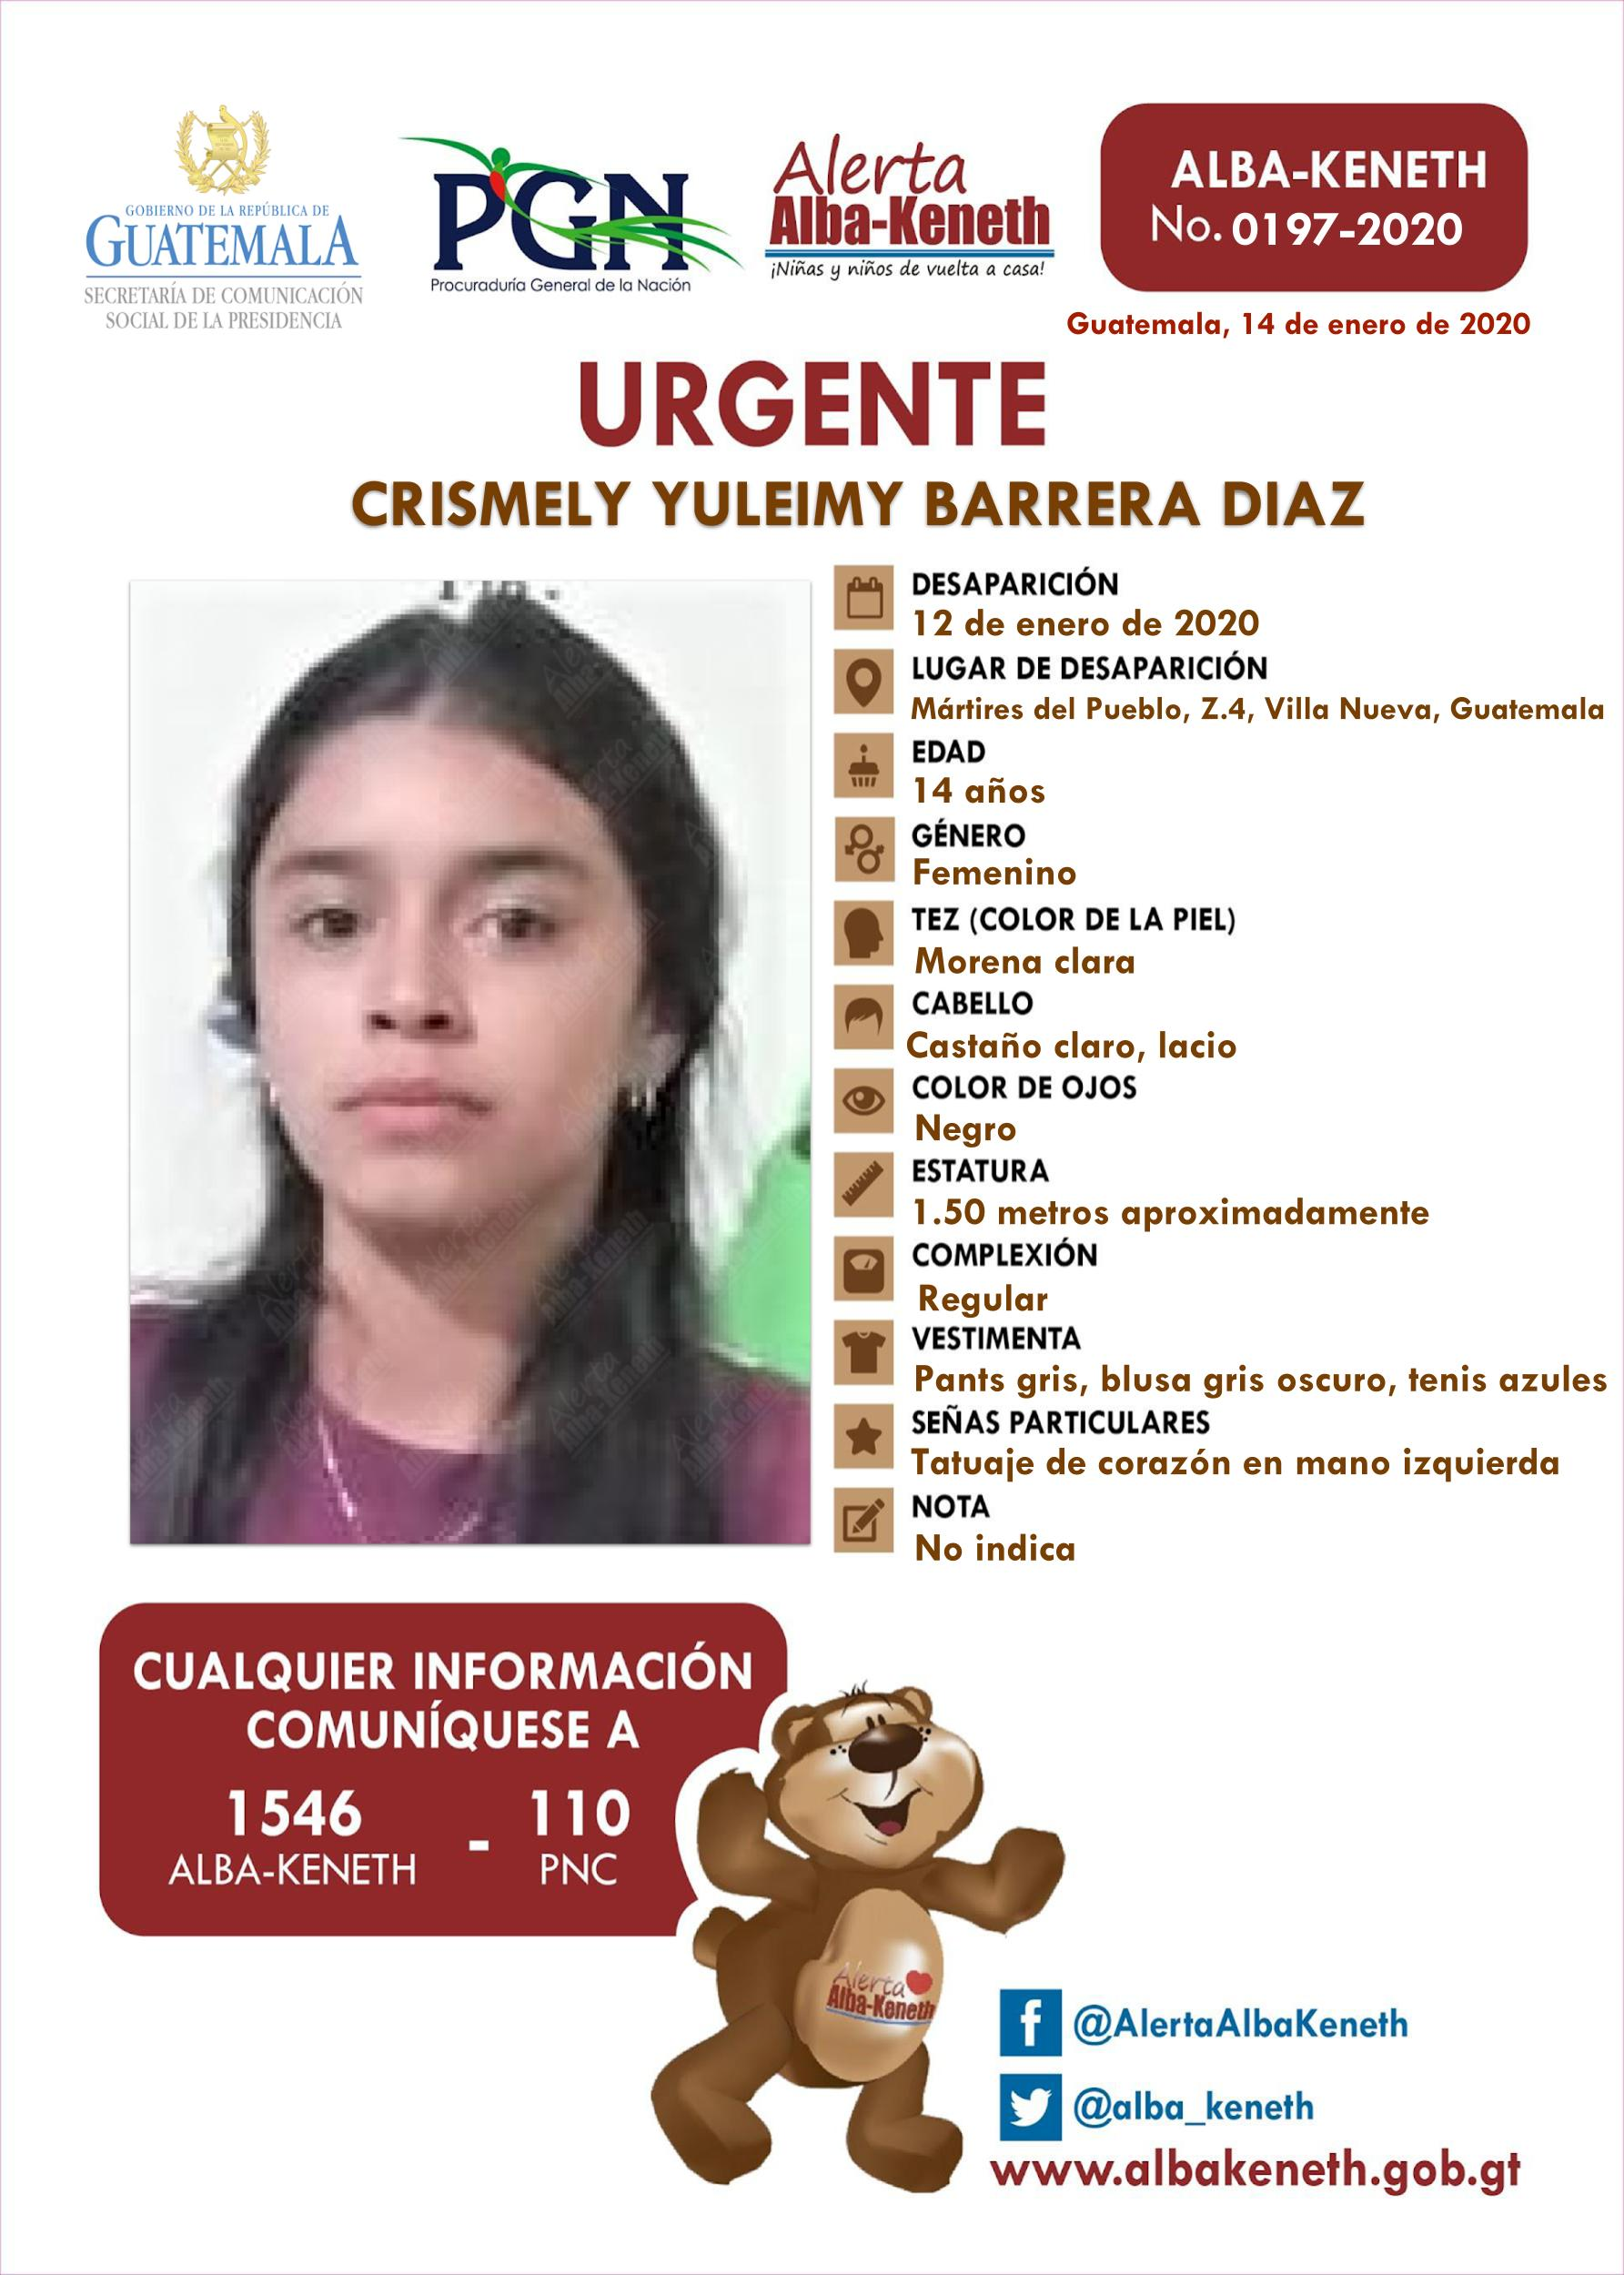 Crismely Yuleimy Barrera Diaz